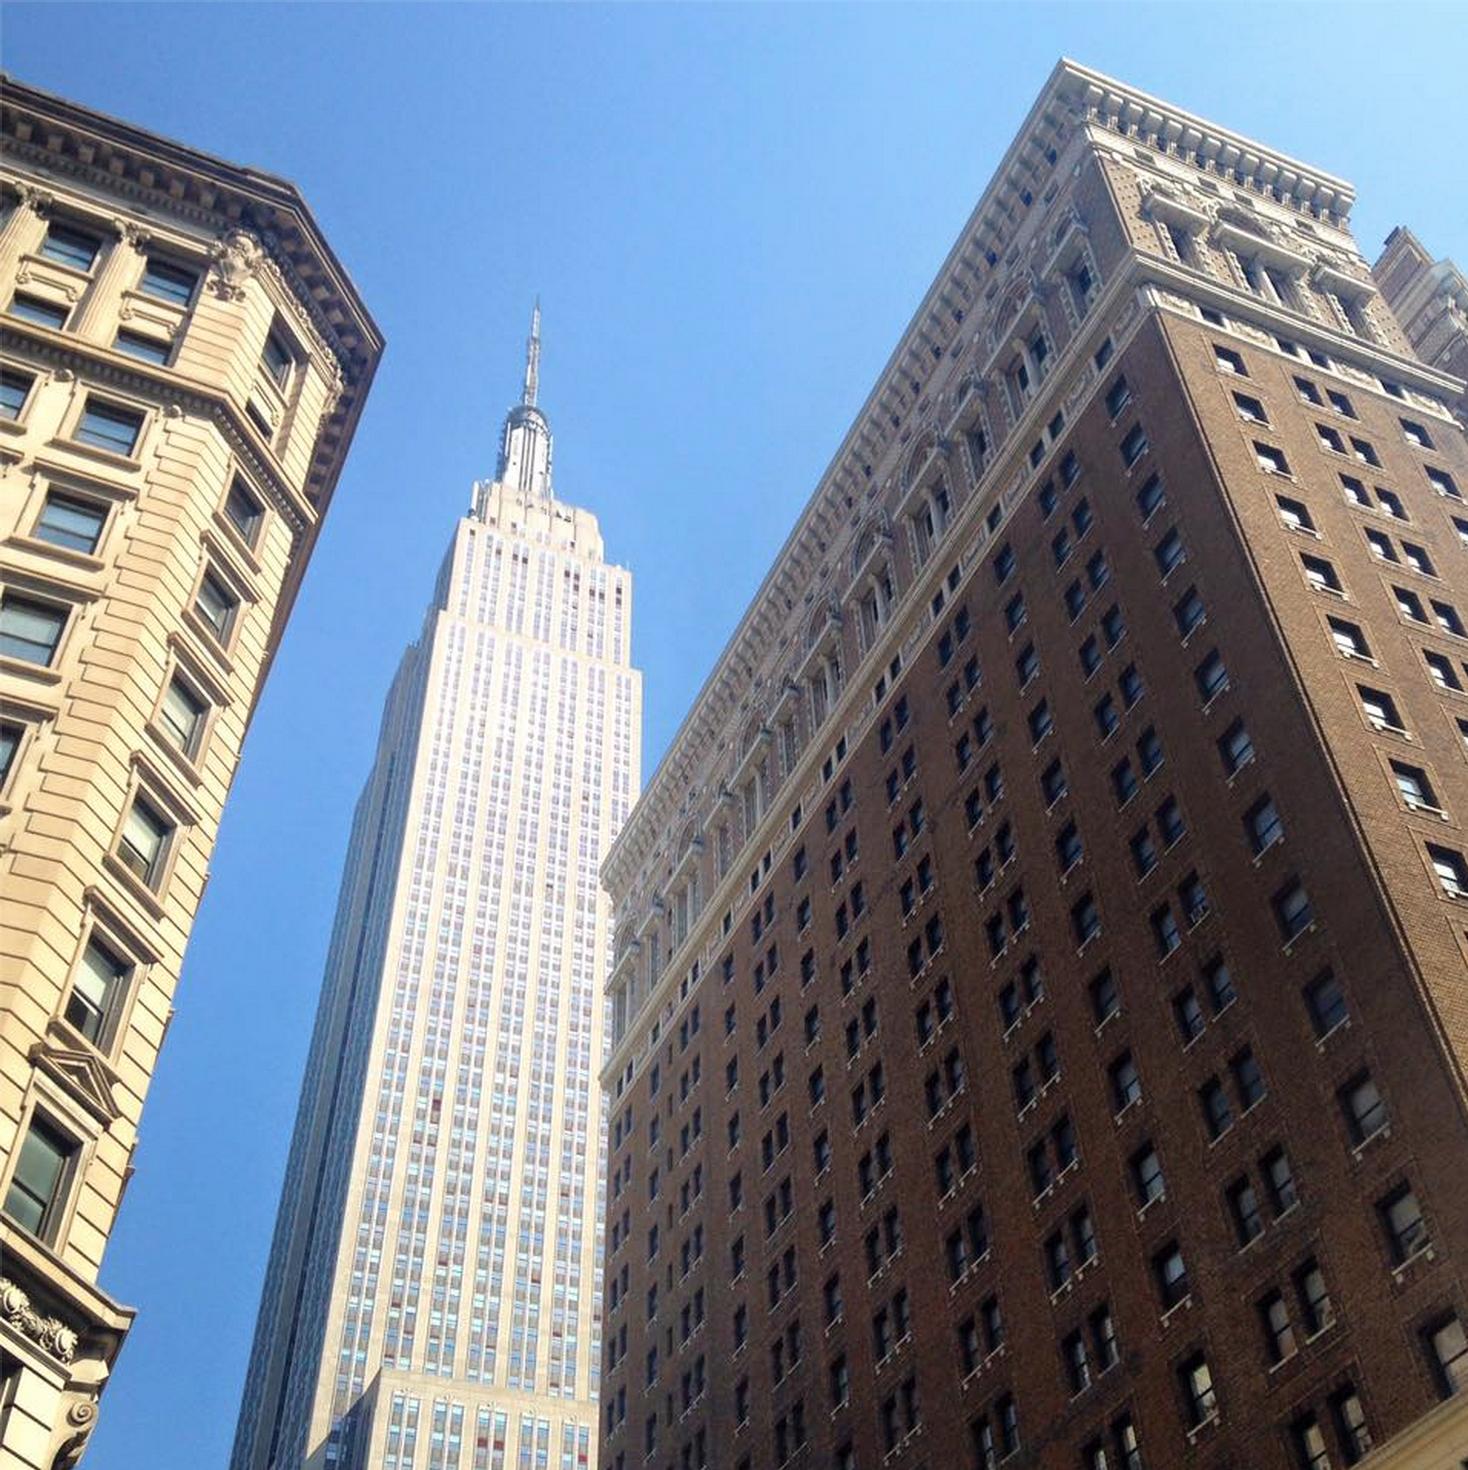 Empire State Building, Manhattan, NYC